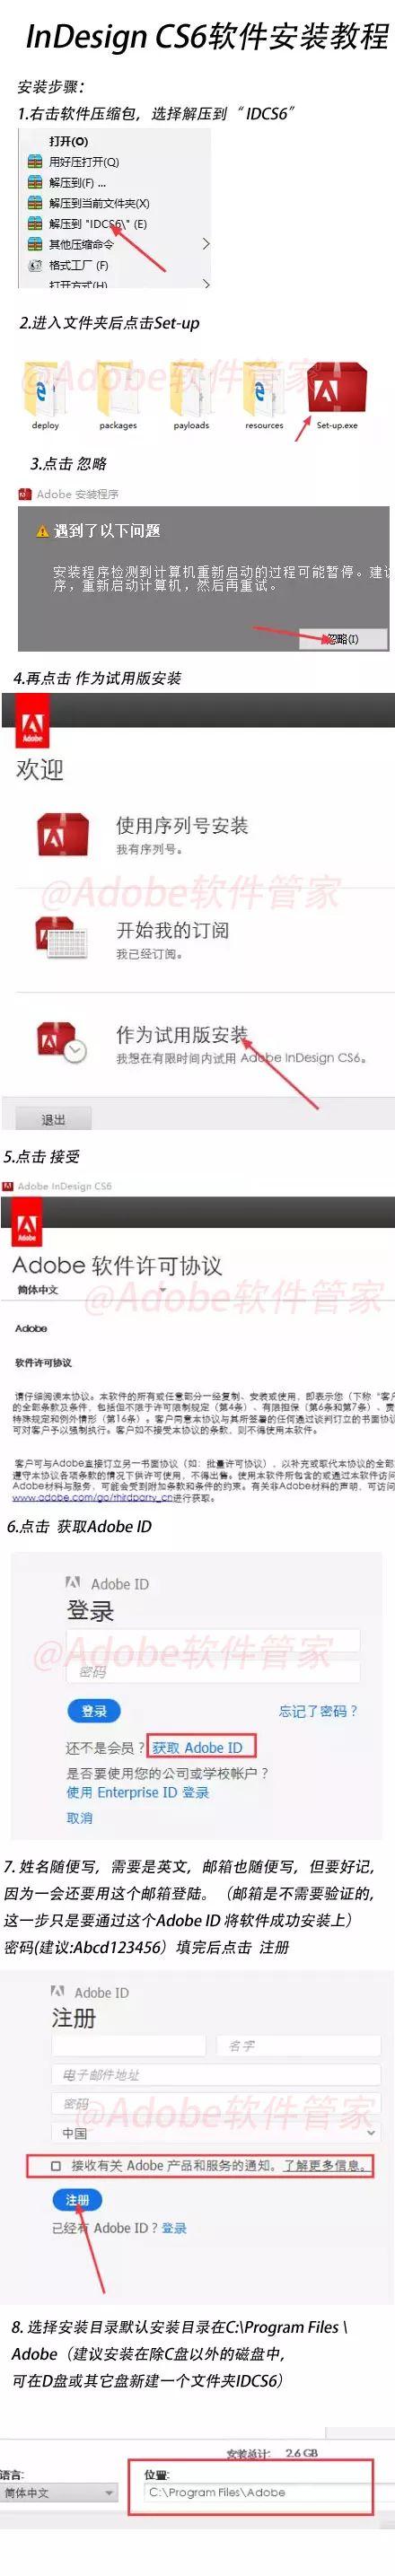 【Adobe软件大全】InDesign CS6软件百度云盘资源/安装教程